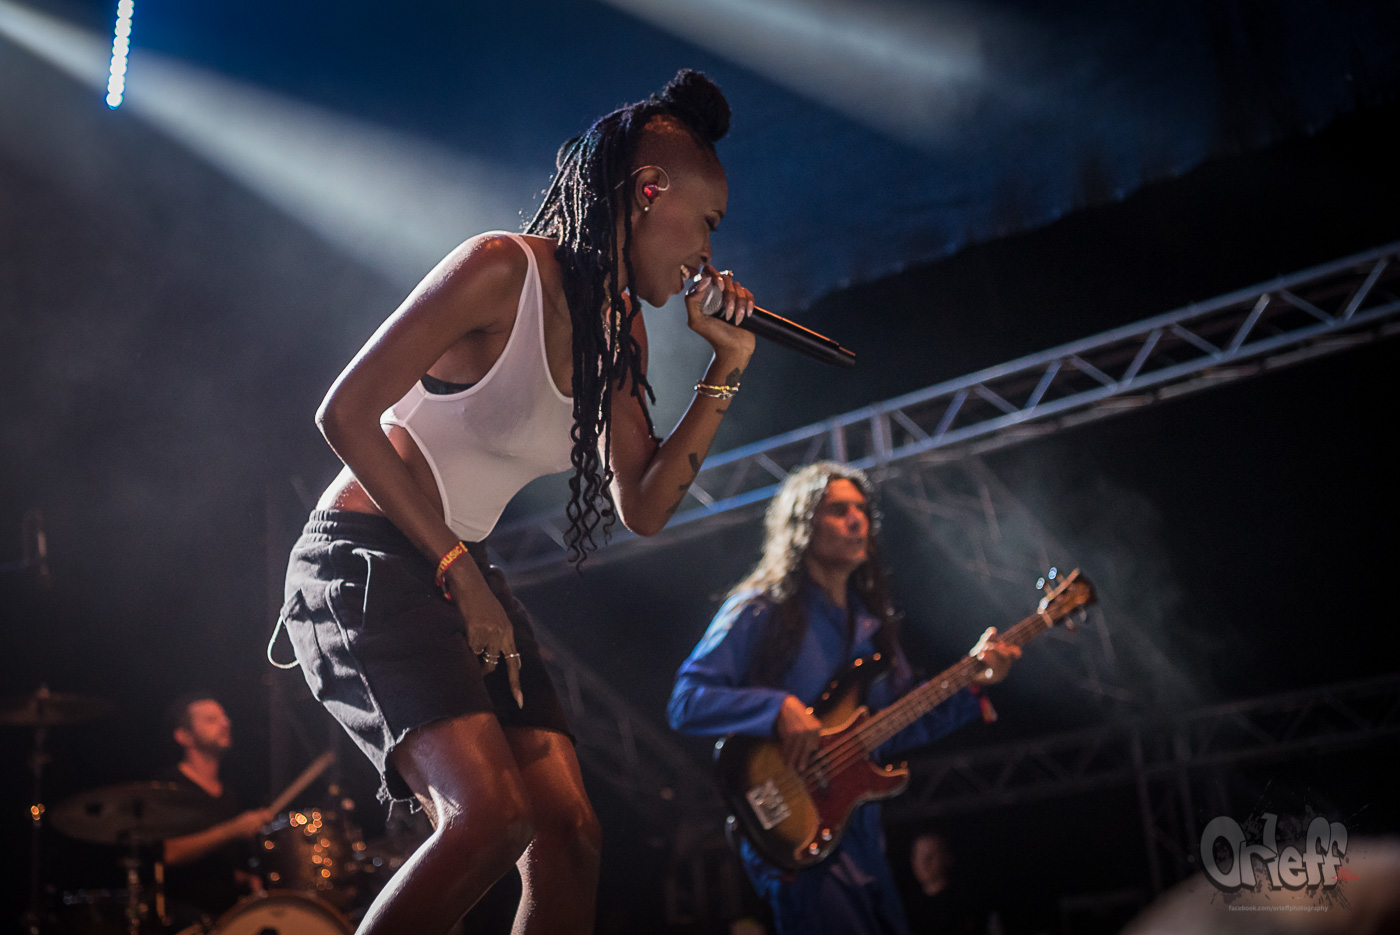 Thievery Corporation @ INmusic festival, 2019